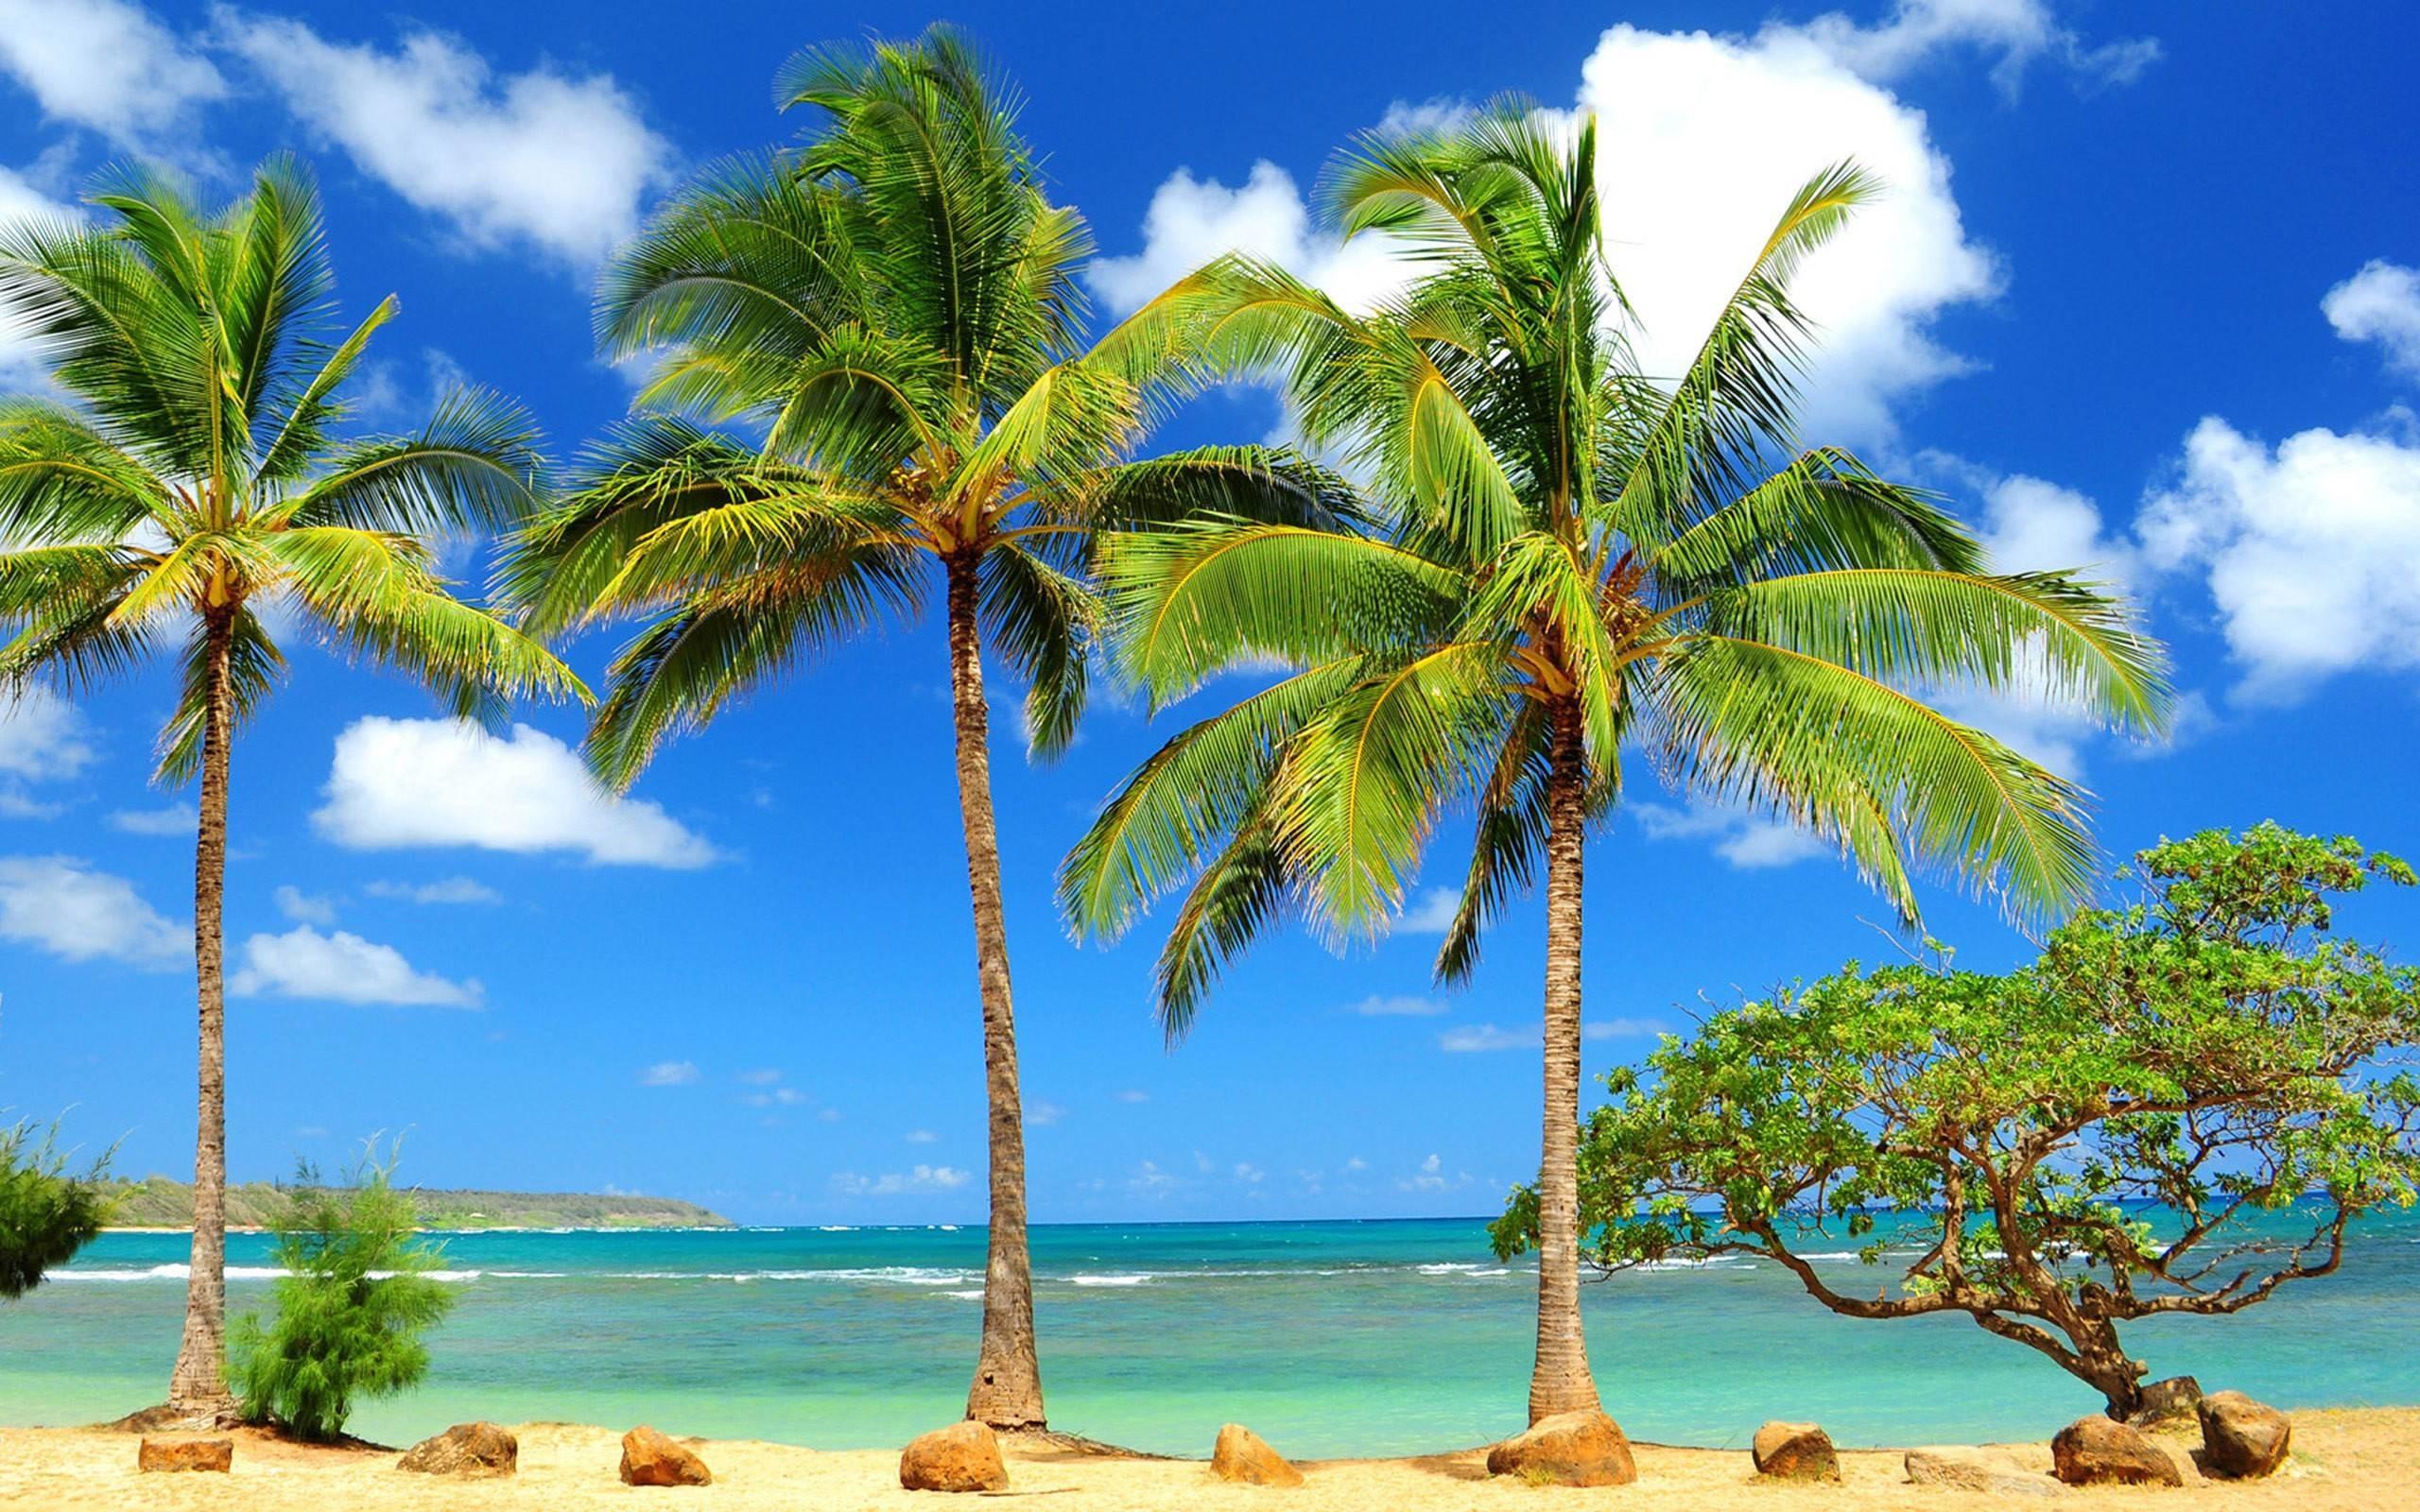 Beach Palm Tree HD Wallpaper Free Download | HD Free Wallpapers .